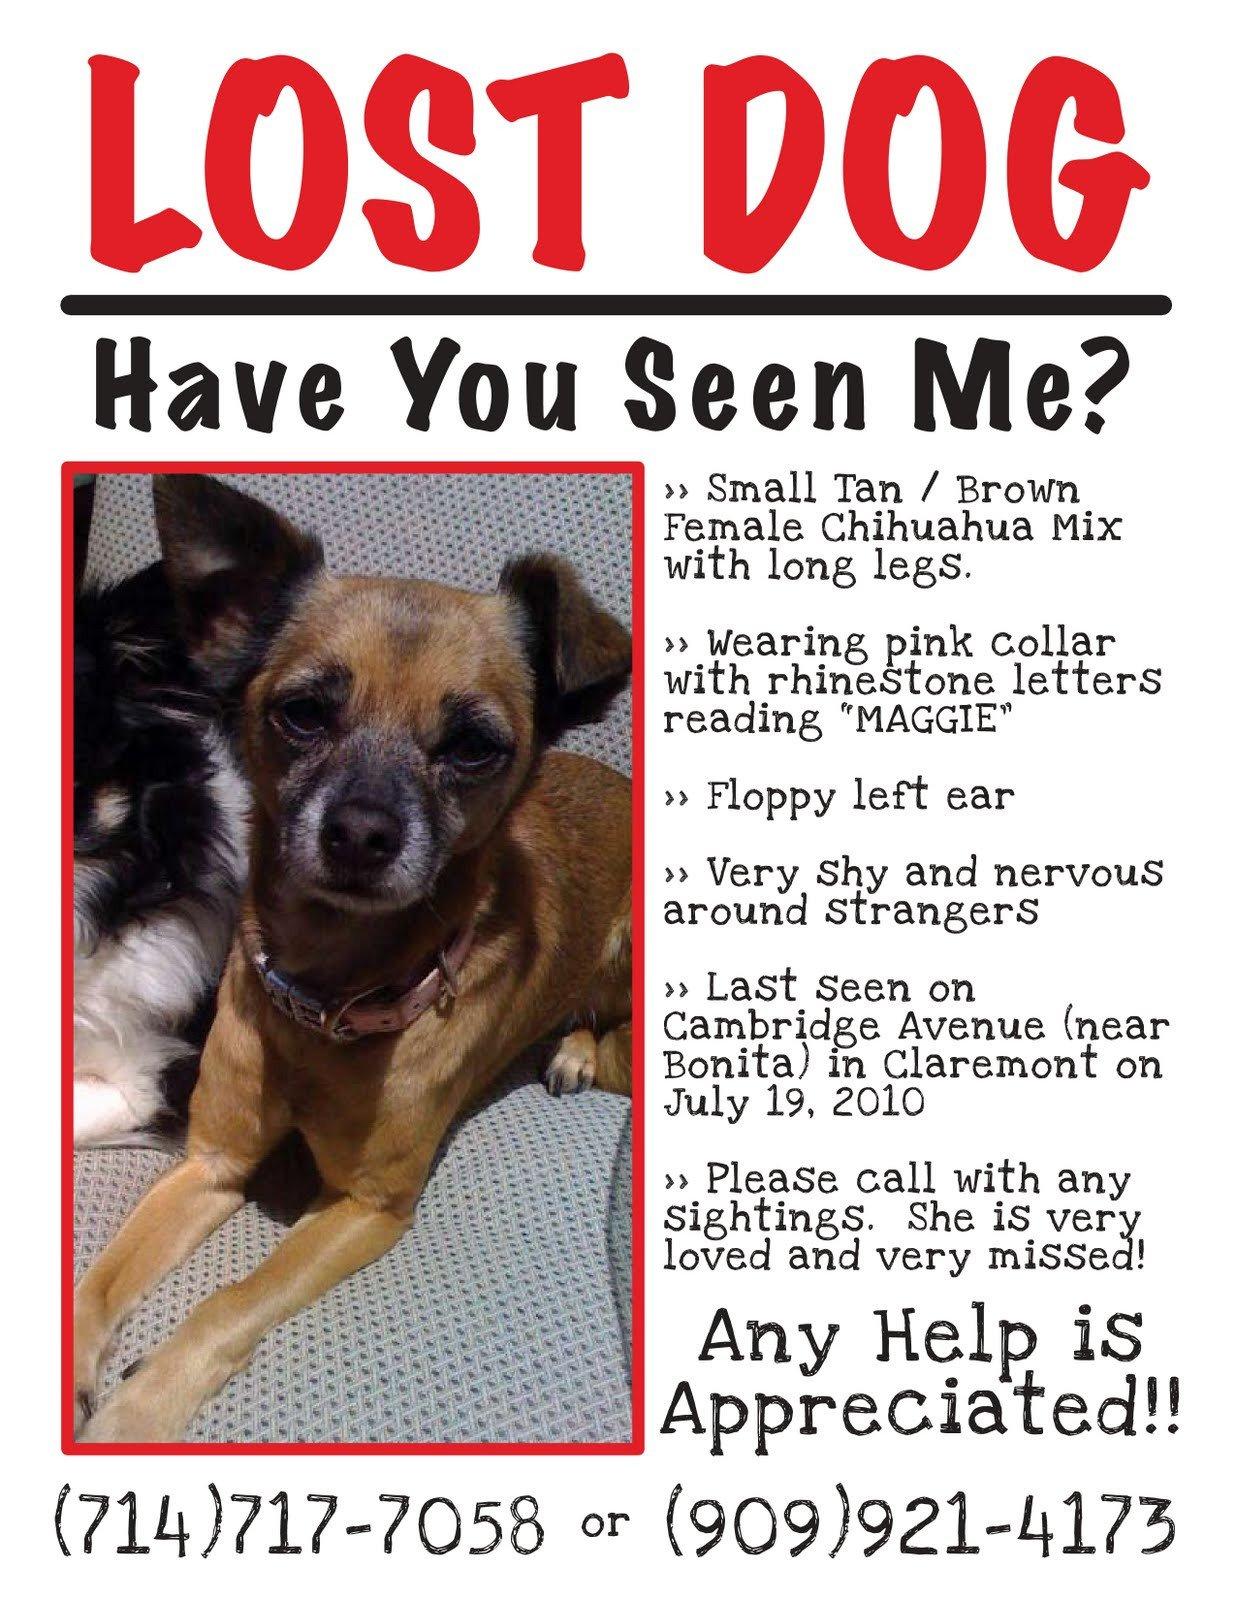 Lost Dog Flyer Template Claremont Insider Lost Dog